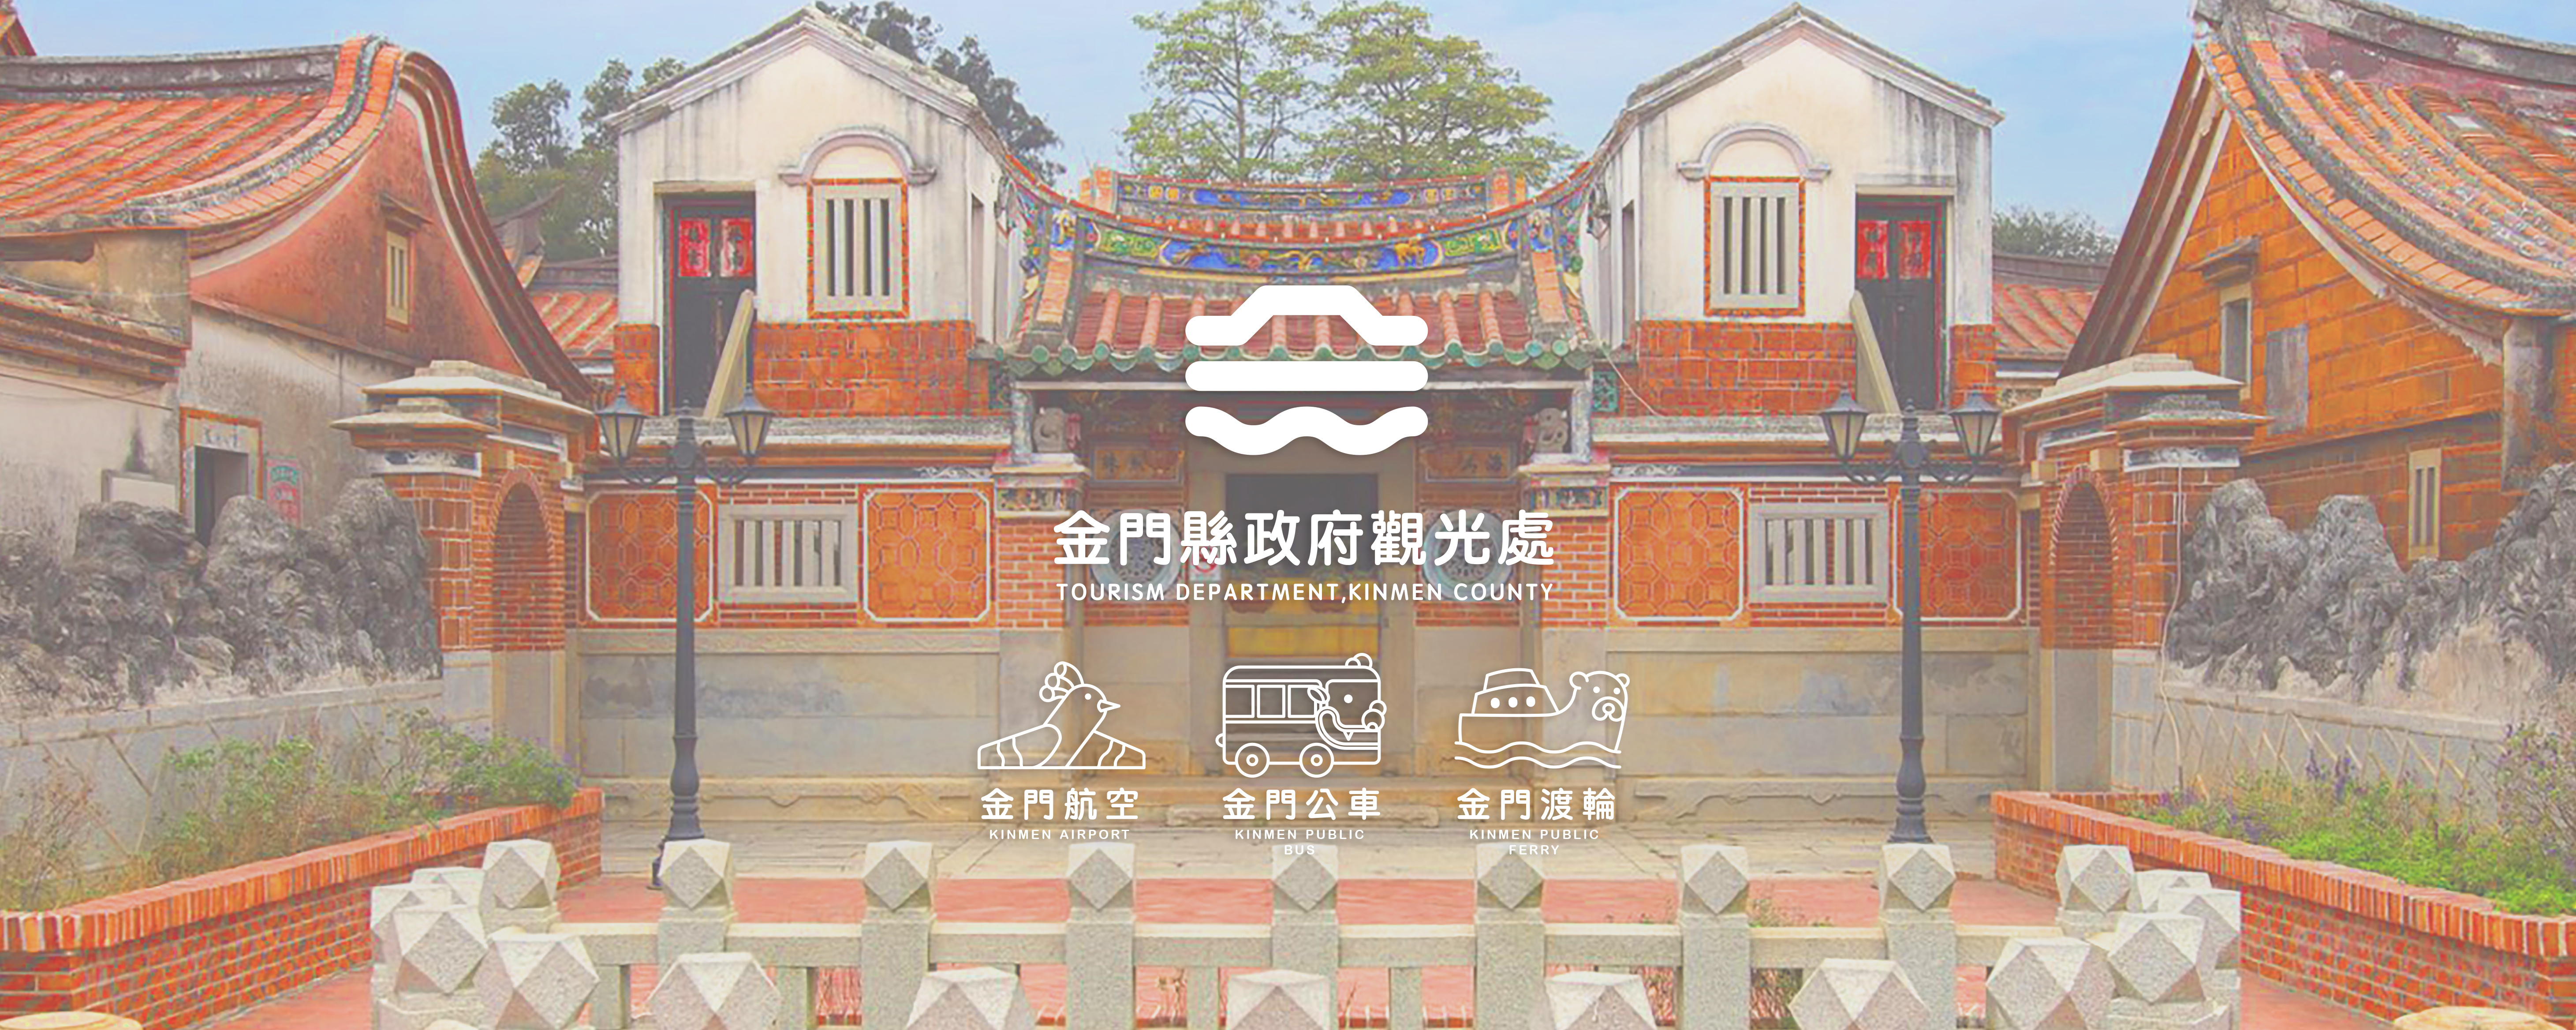 Tourism Department,Kinmen County - Vi Design